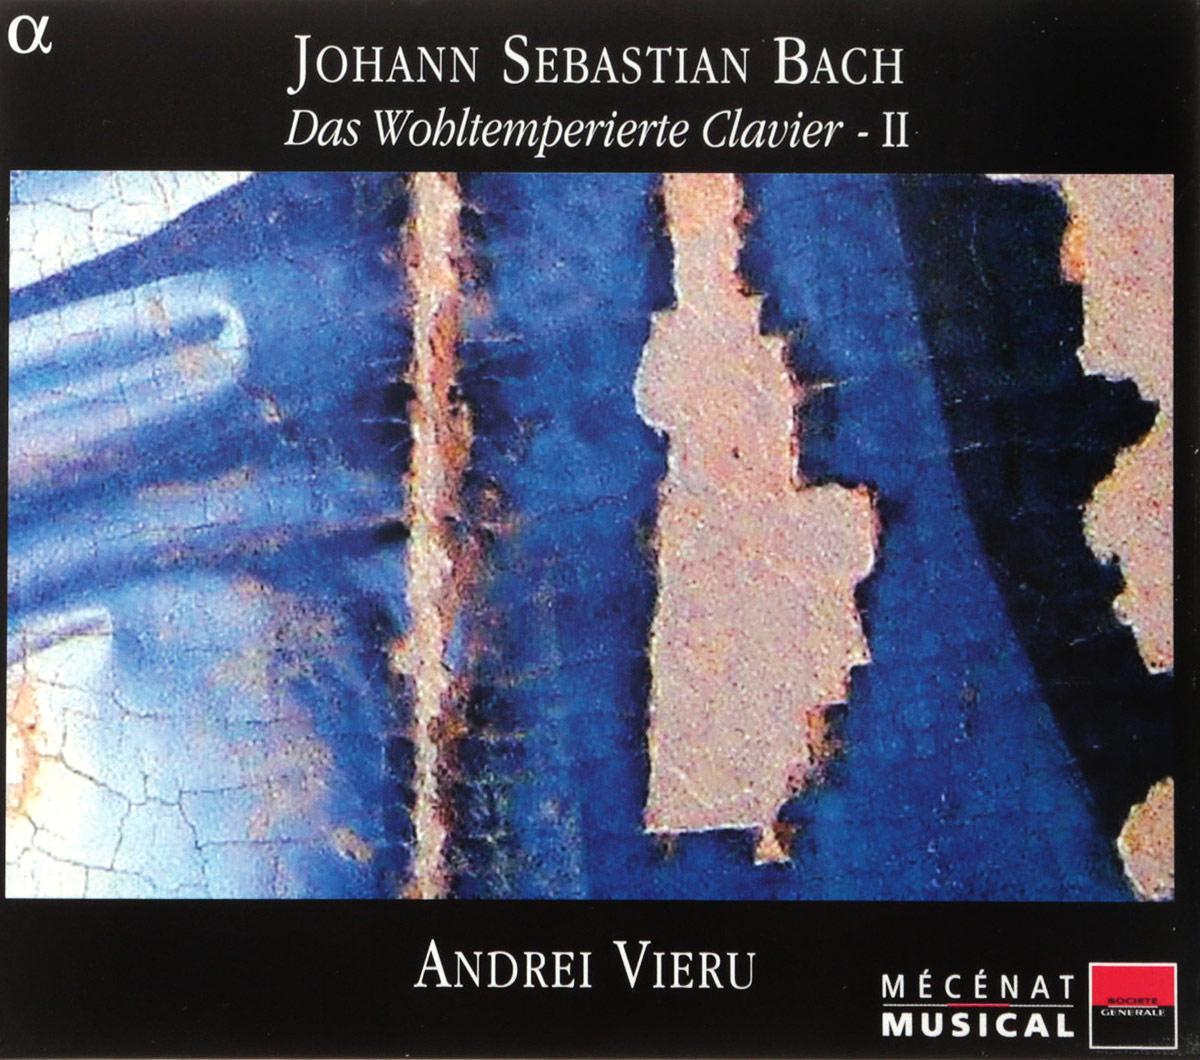 VARIOUS. BACH, J.S./THE WELL-TEMPERED CLAVIER, VOL.II BWV870-893/ANDREI VIERU (PIANO). 3 andrei ivanov kuutõbise pihtimus